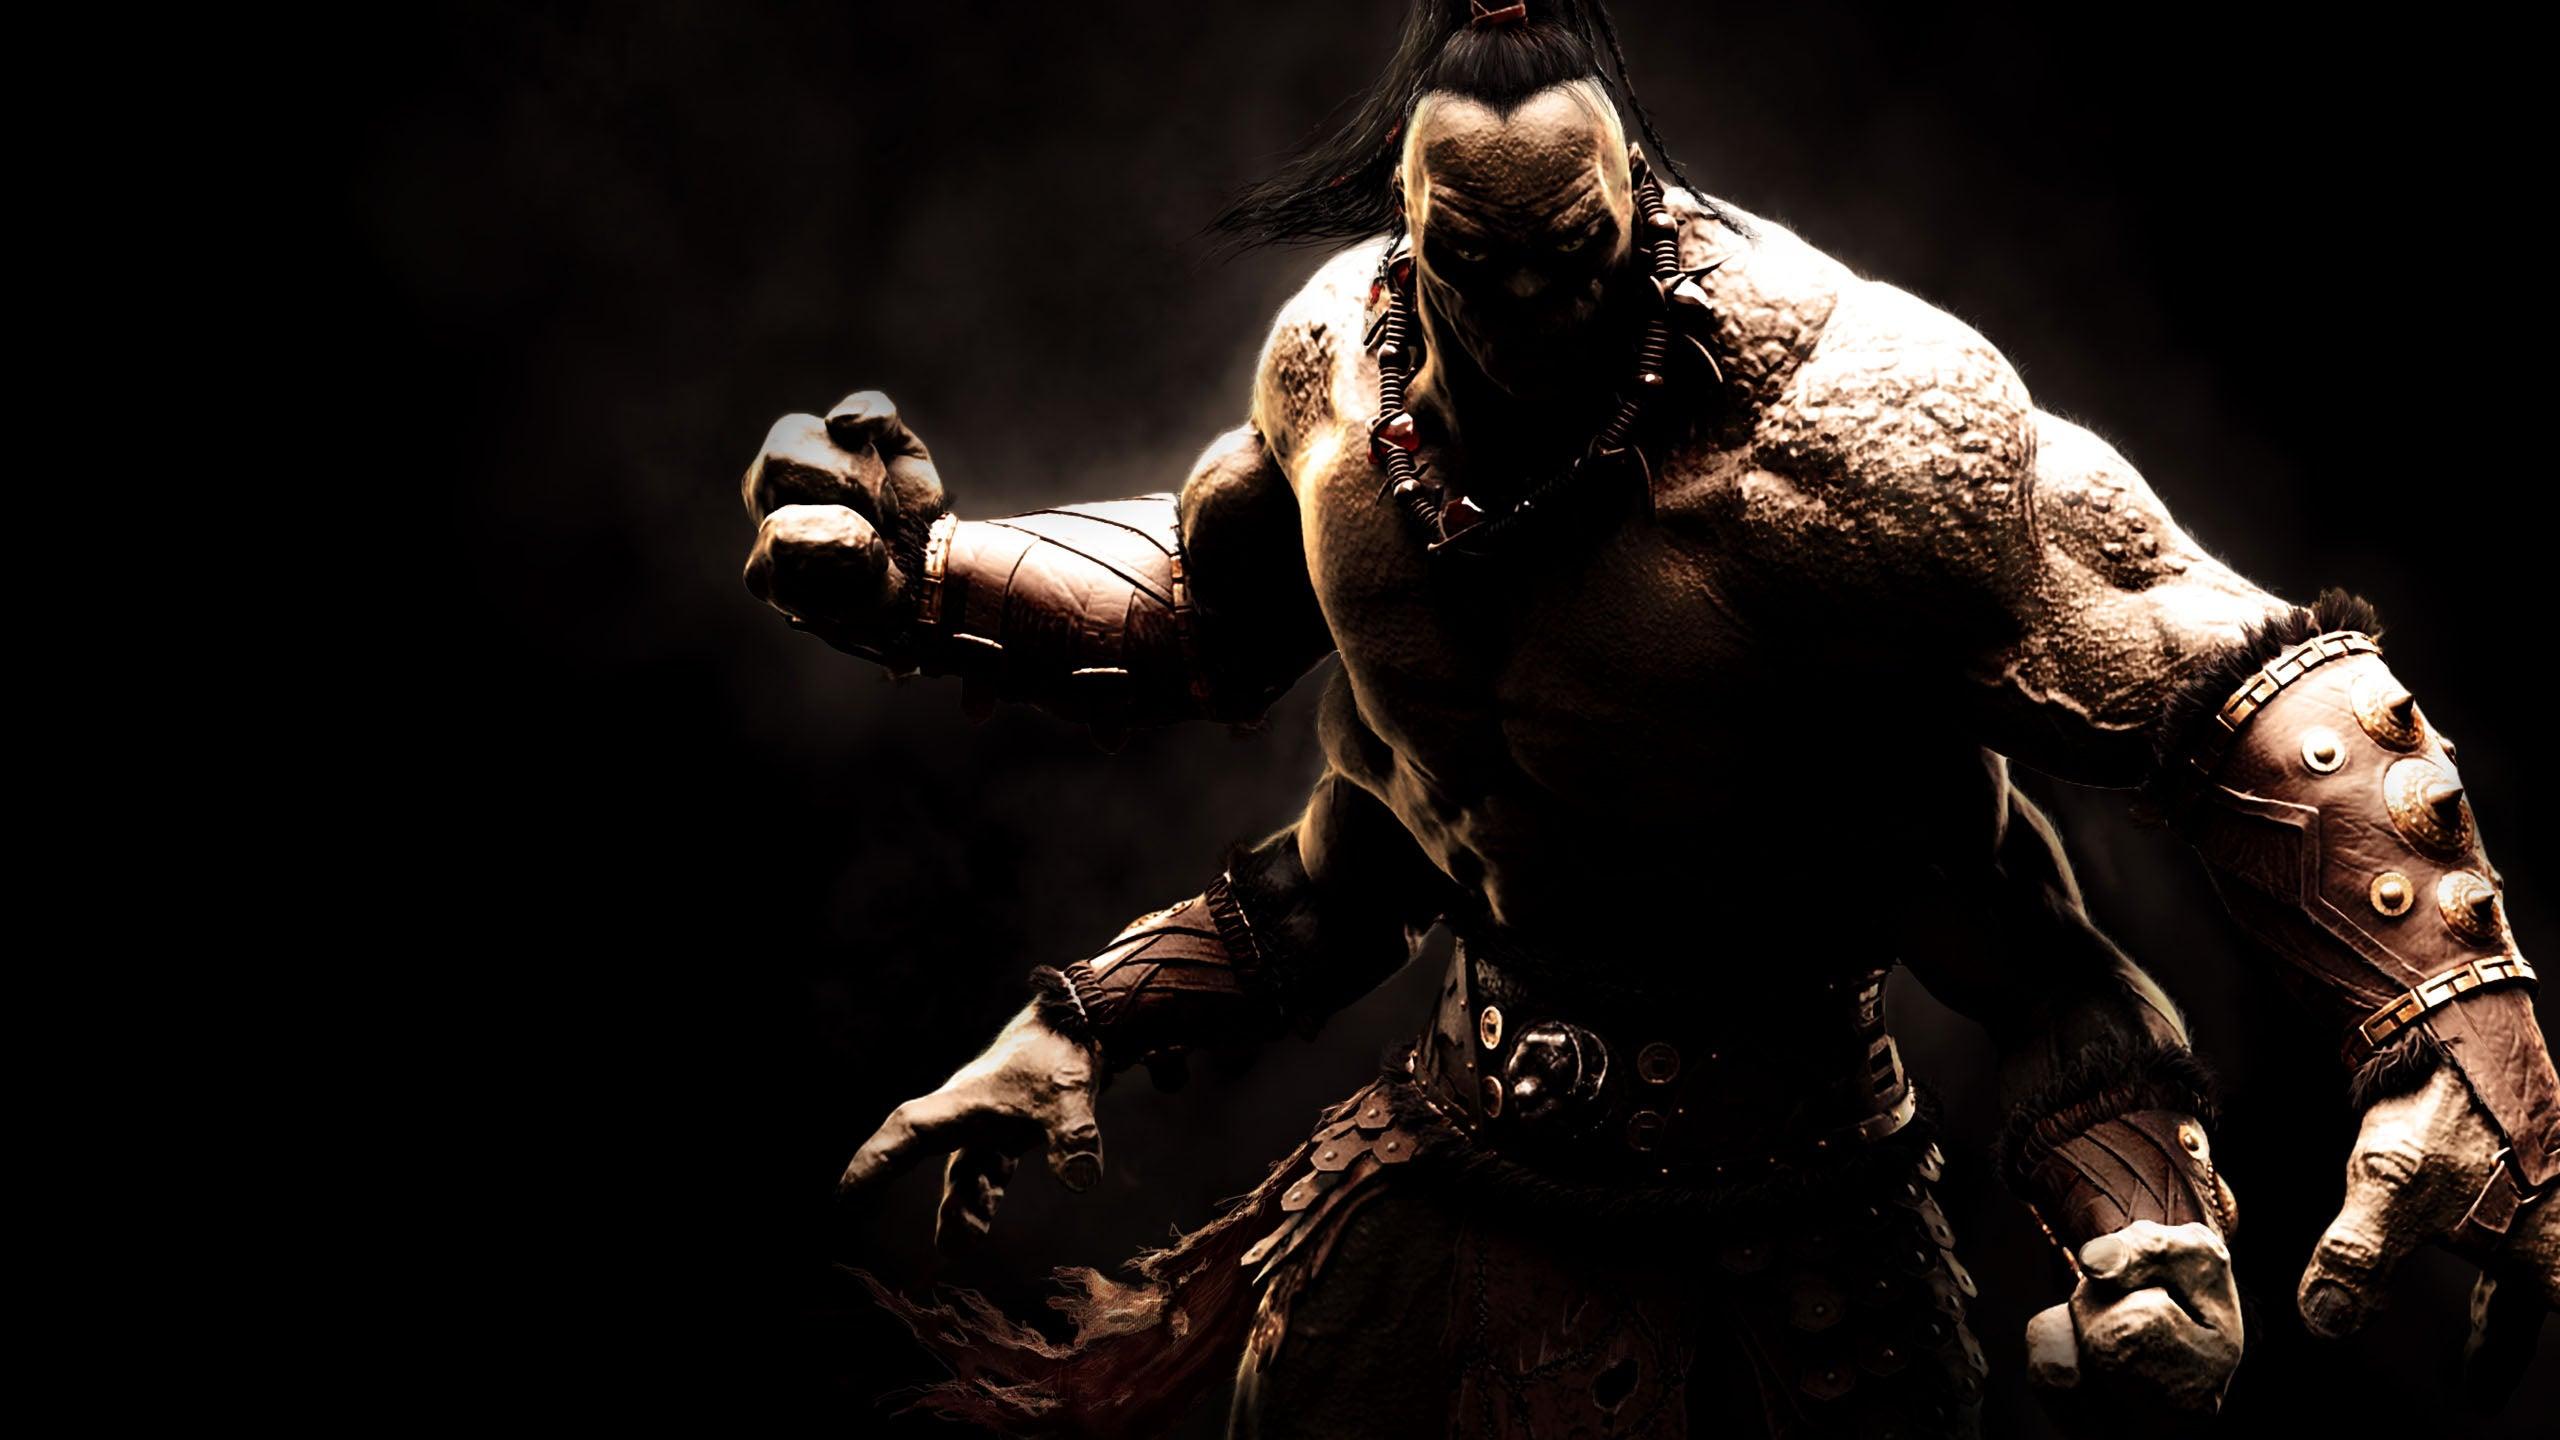 ��������� ���� ������ Mortal Kombat X